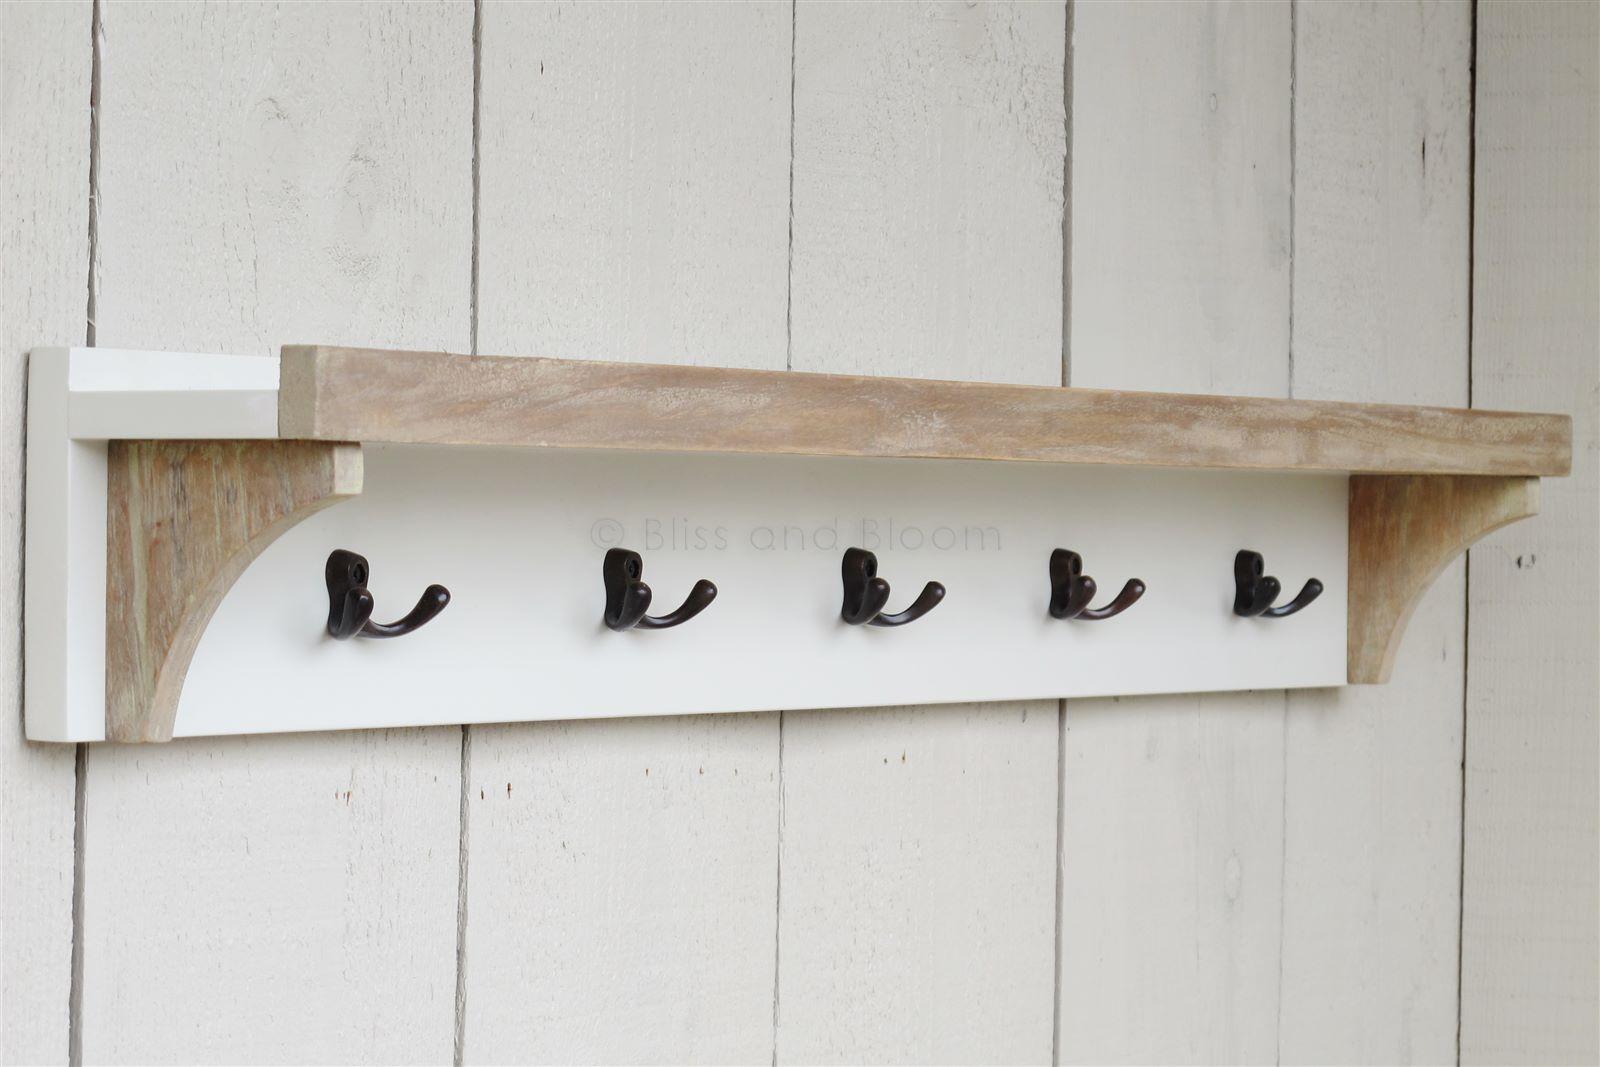 Coat Rack With Shelf 5 Hooks Bliss And Bloom Ltd